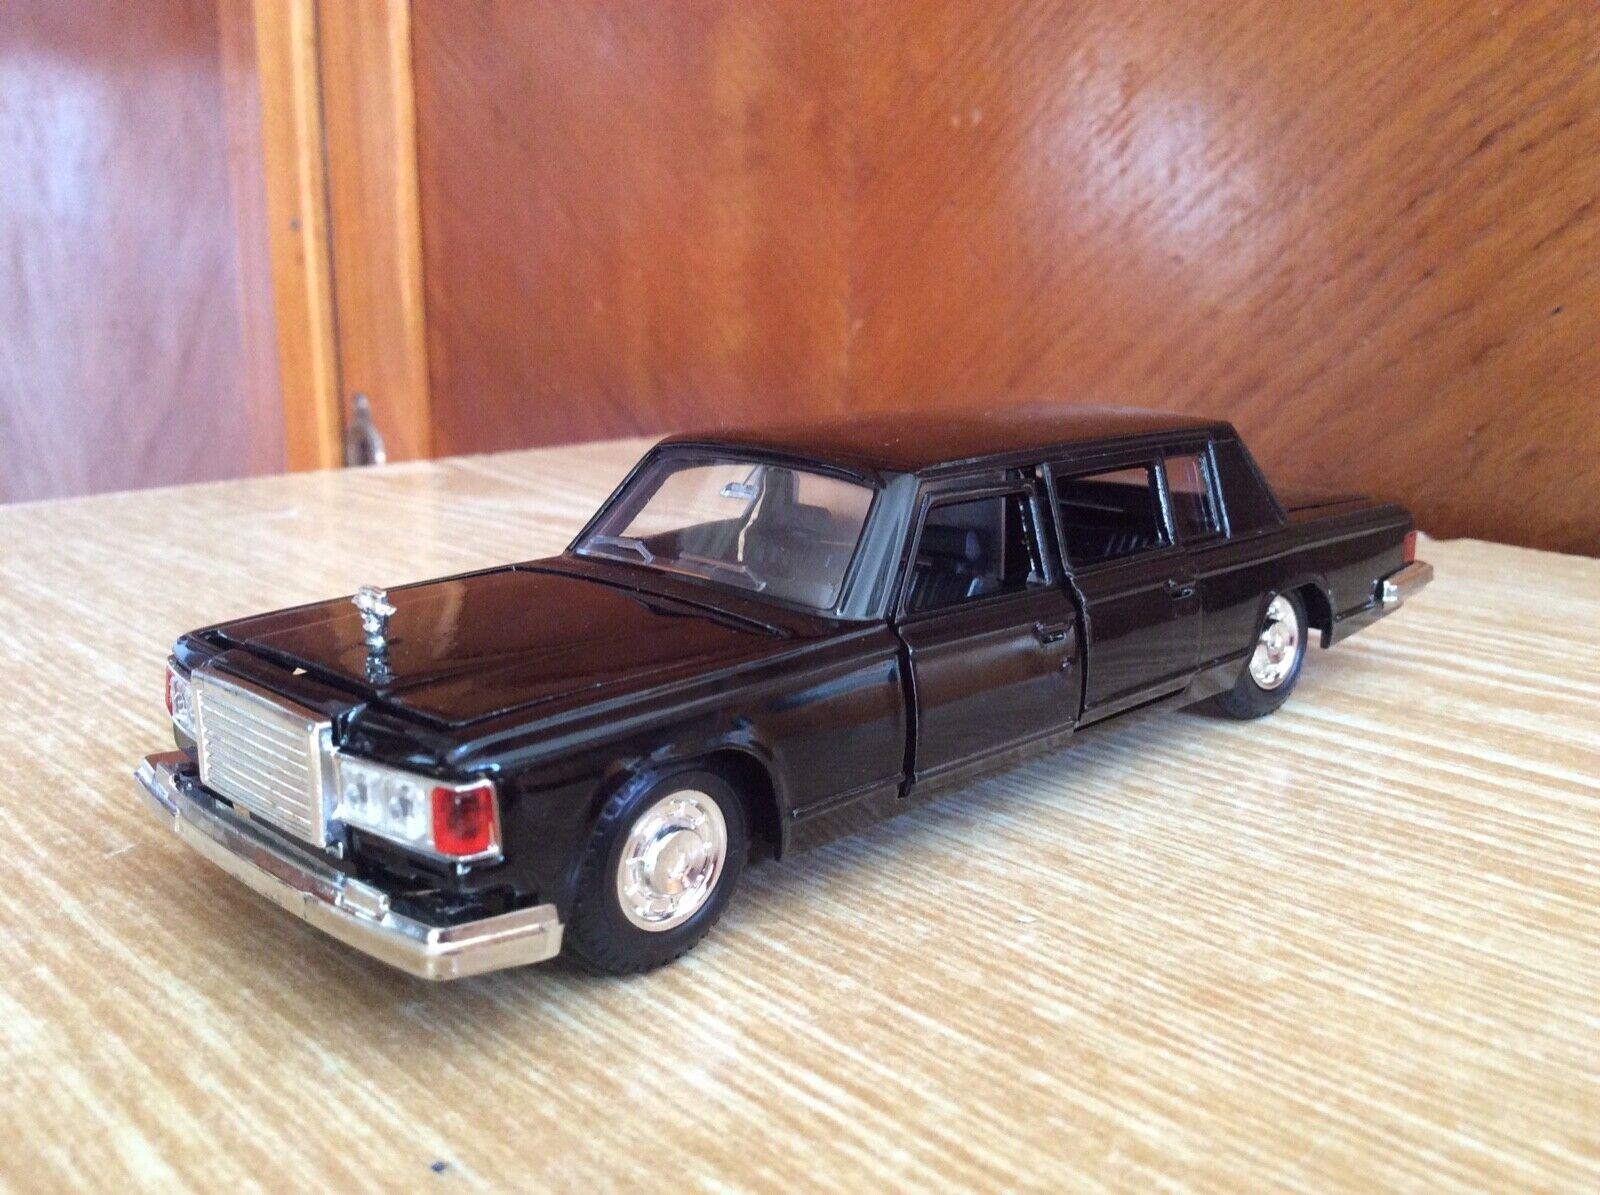 ZIL-115 black 1 43 USSR car